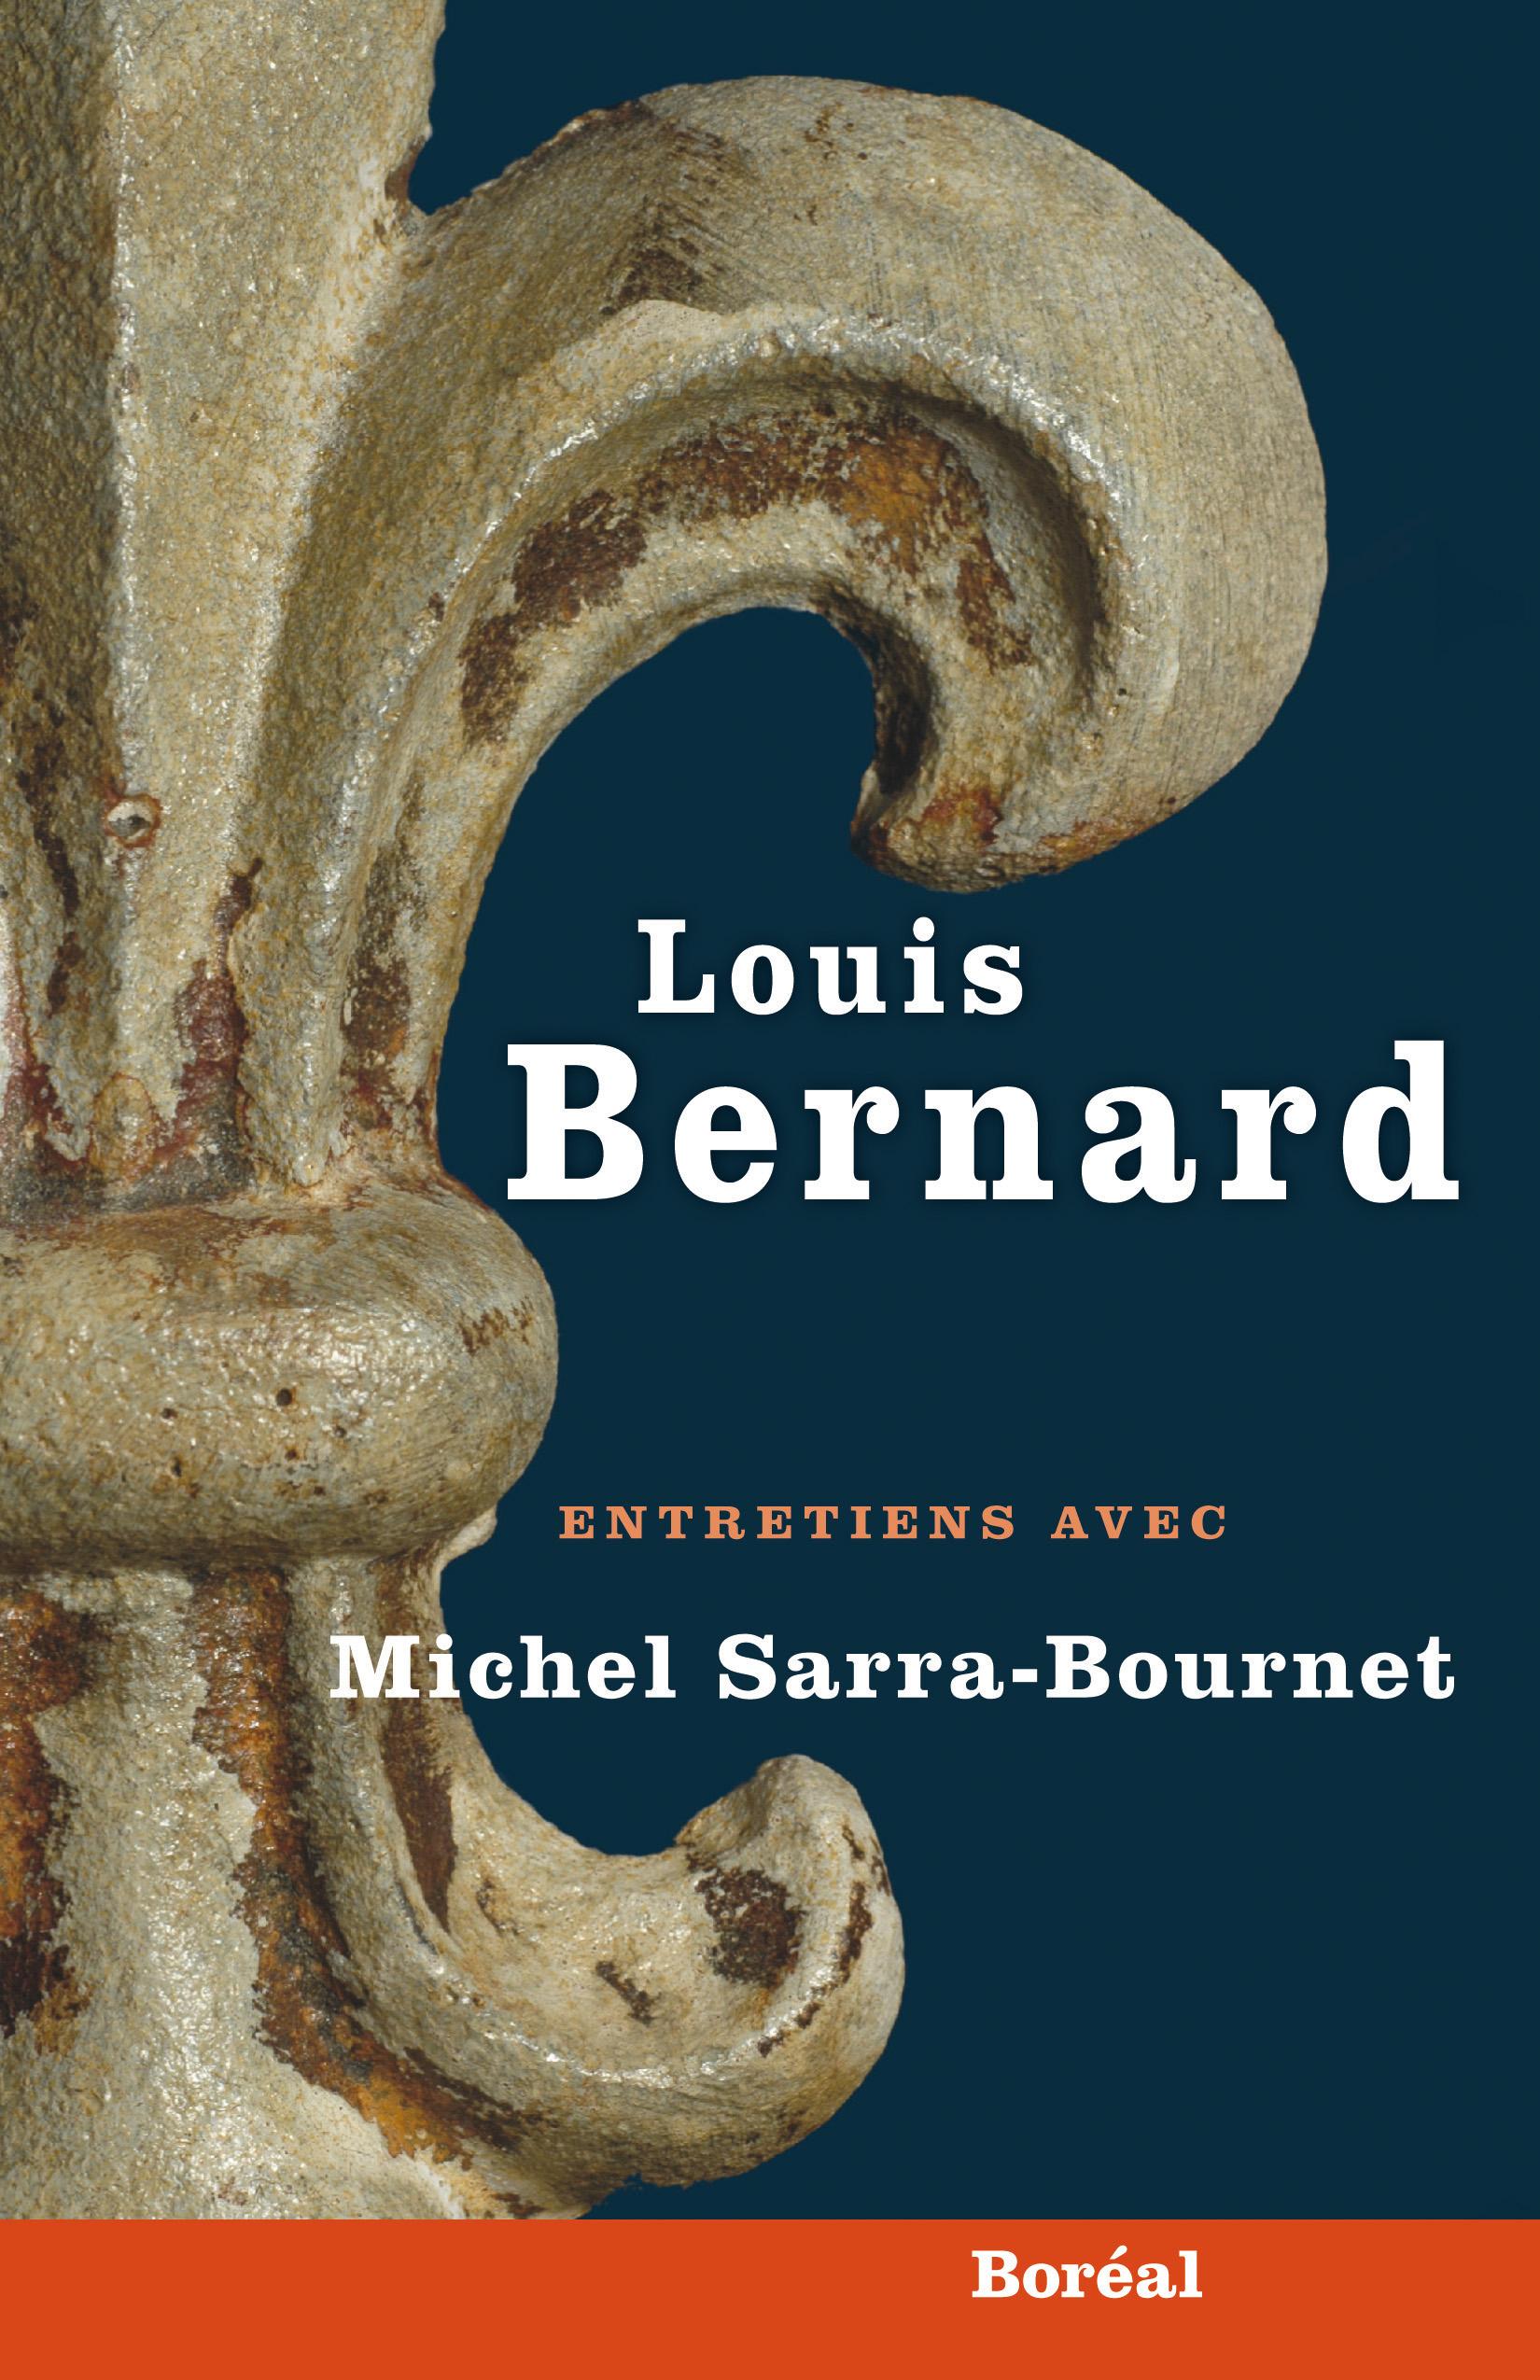 Louis Bernard. Entretiens